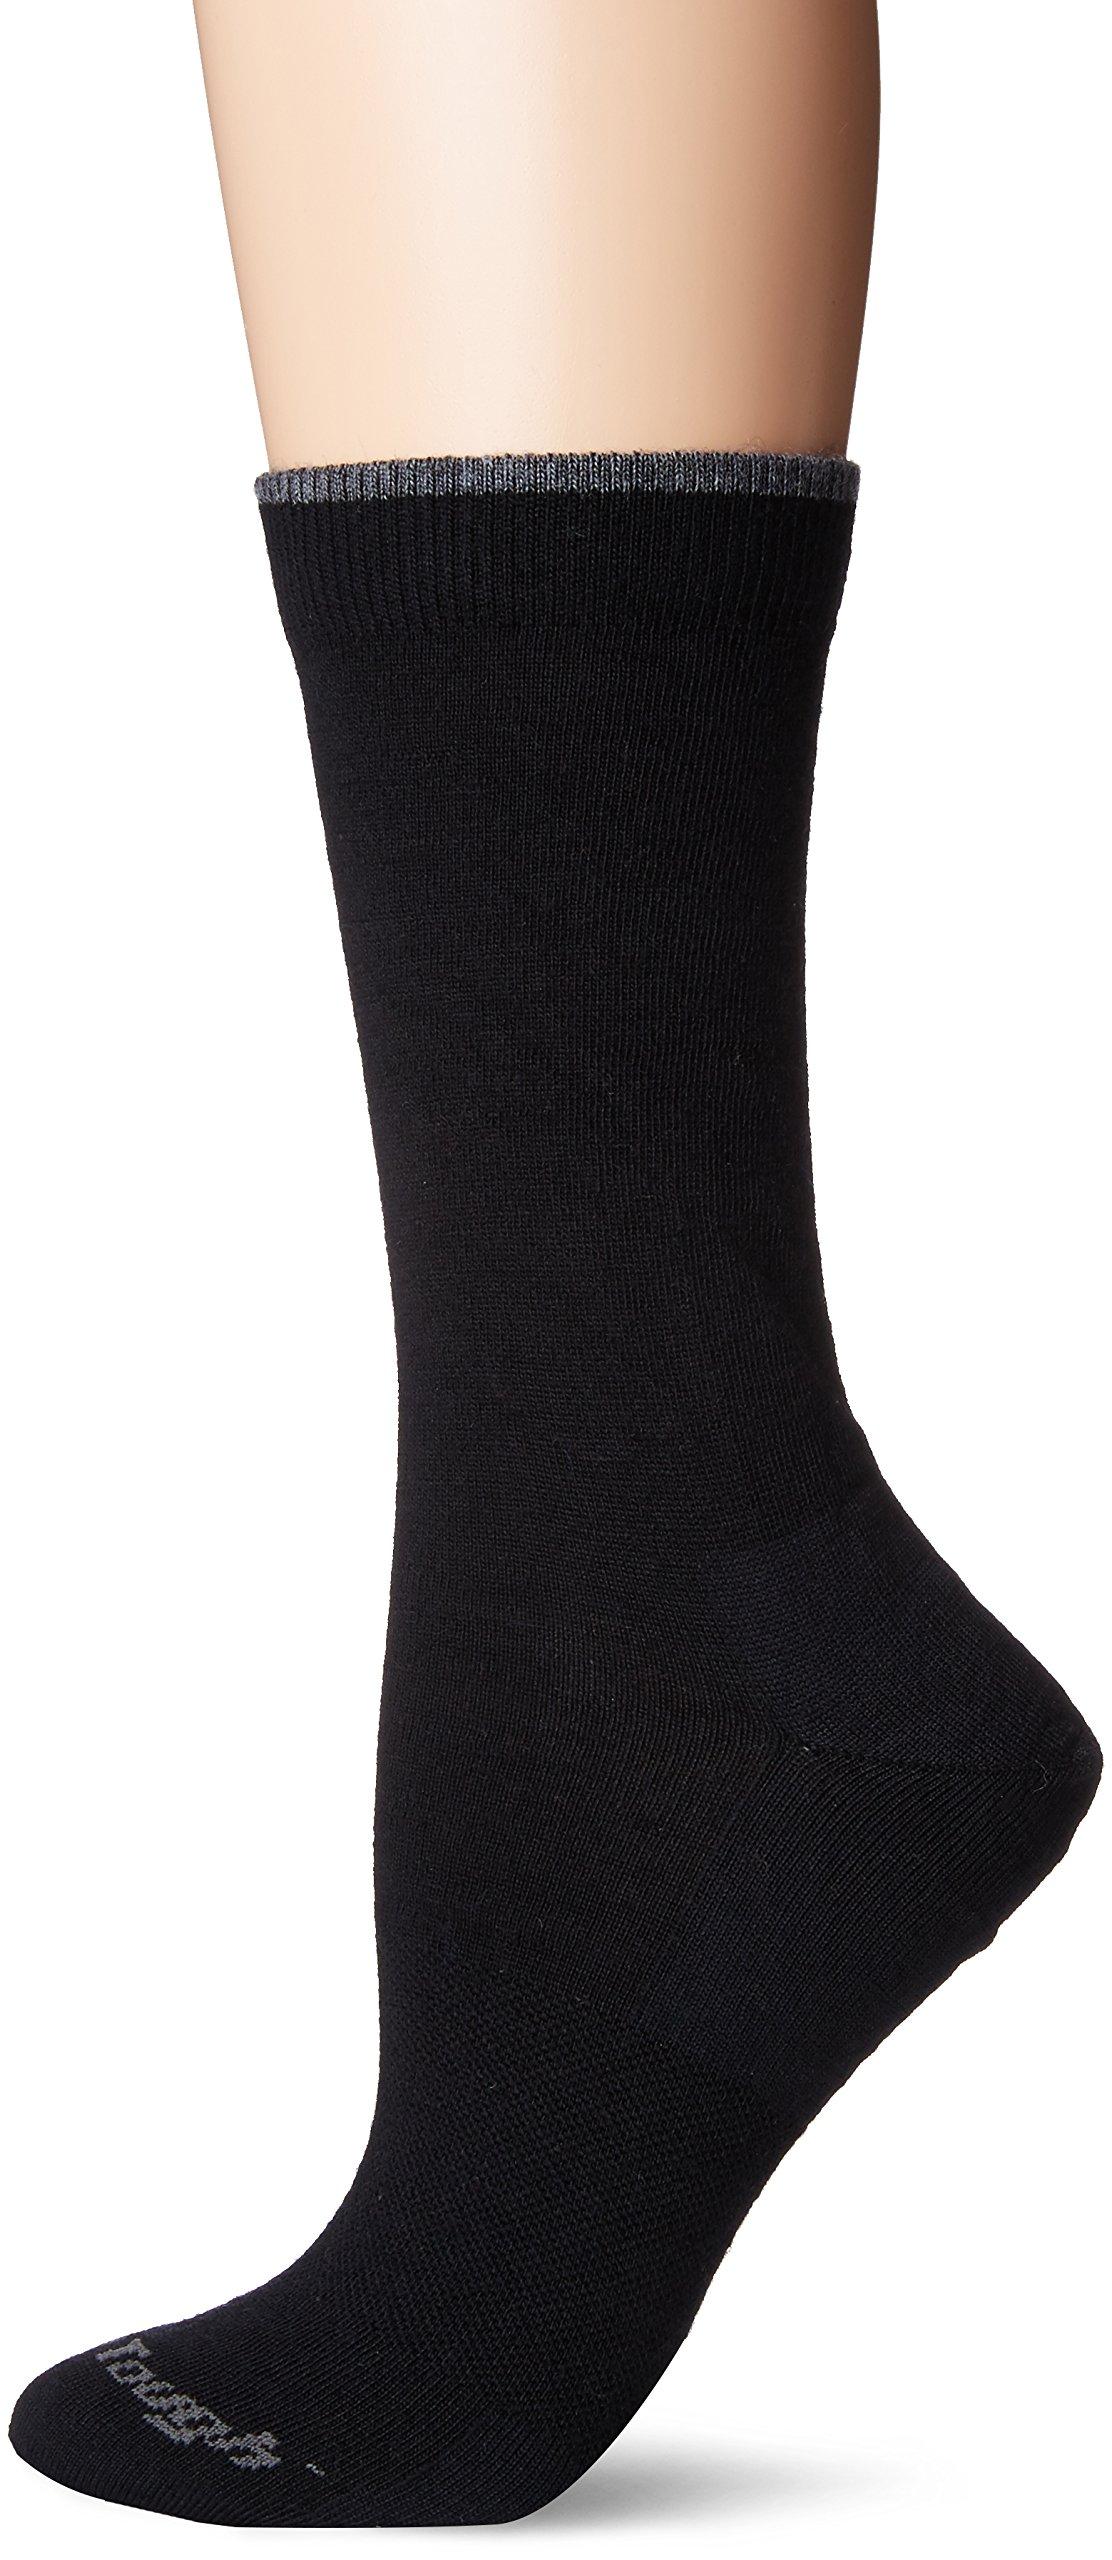 Darn Tough Vermont Women's Solid Crew Light Cushion Hiking Socks, Black, Medium (7.5-9.5)